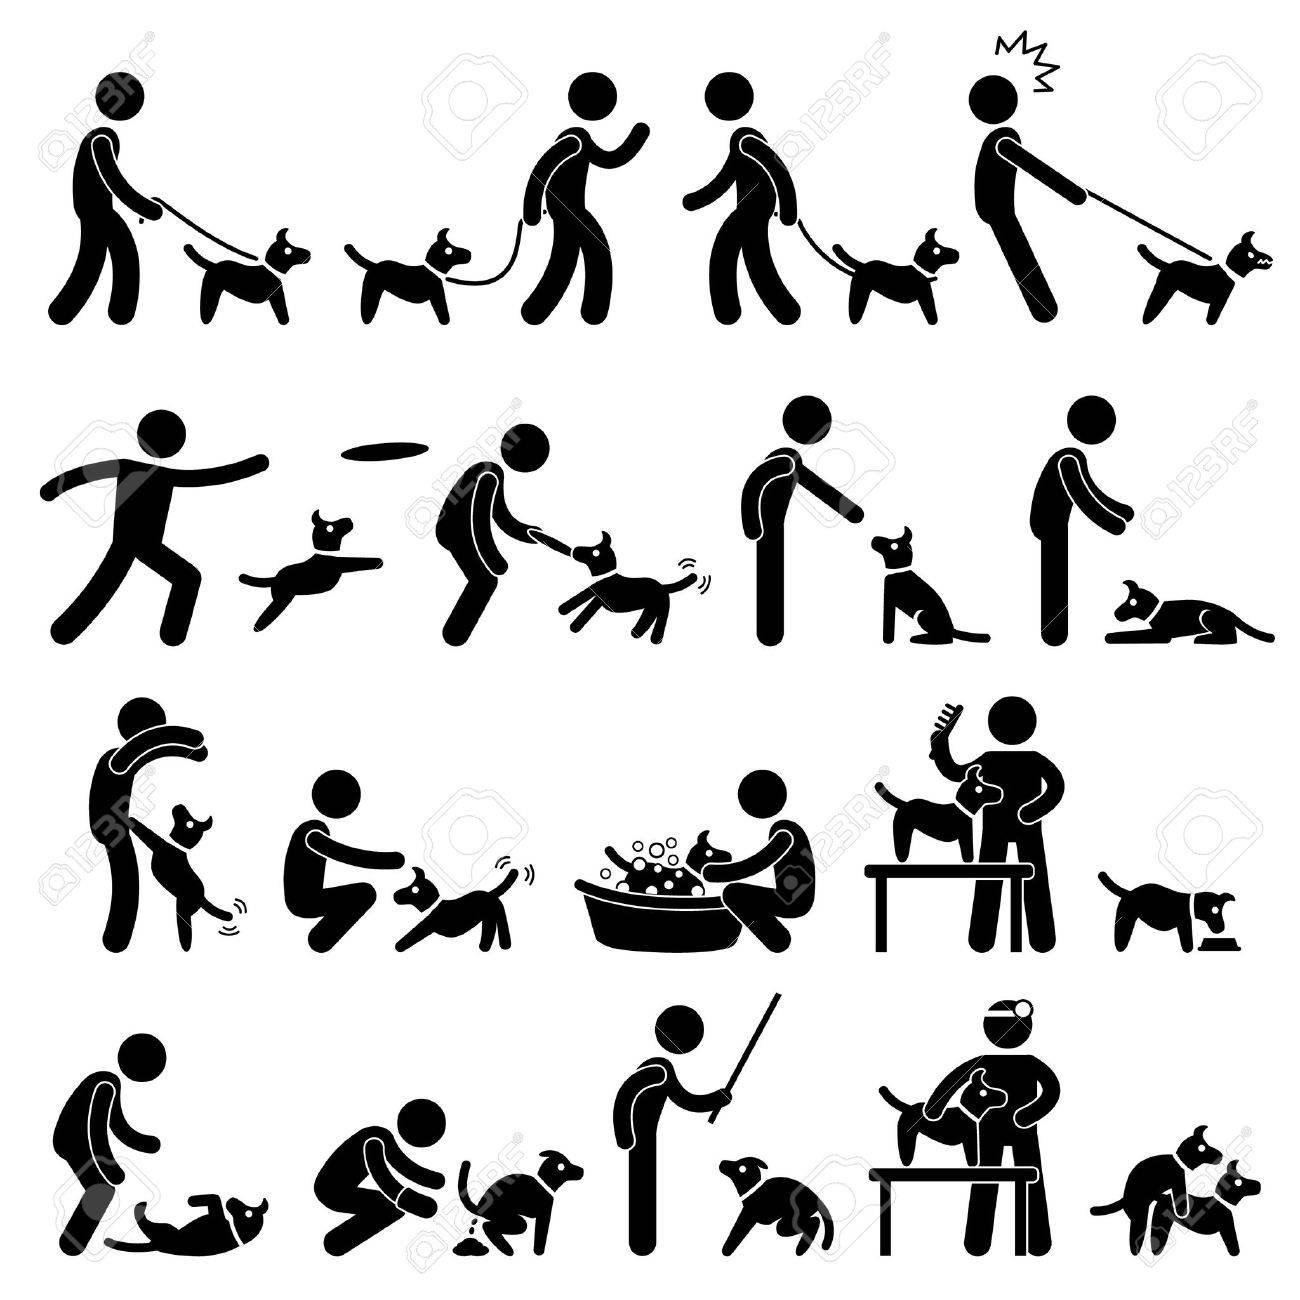 Man Dog Training Playing Pet Stick Figure Pictogram Icon Stock Vector - 18812194